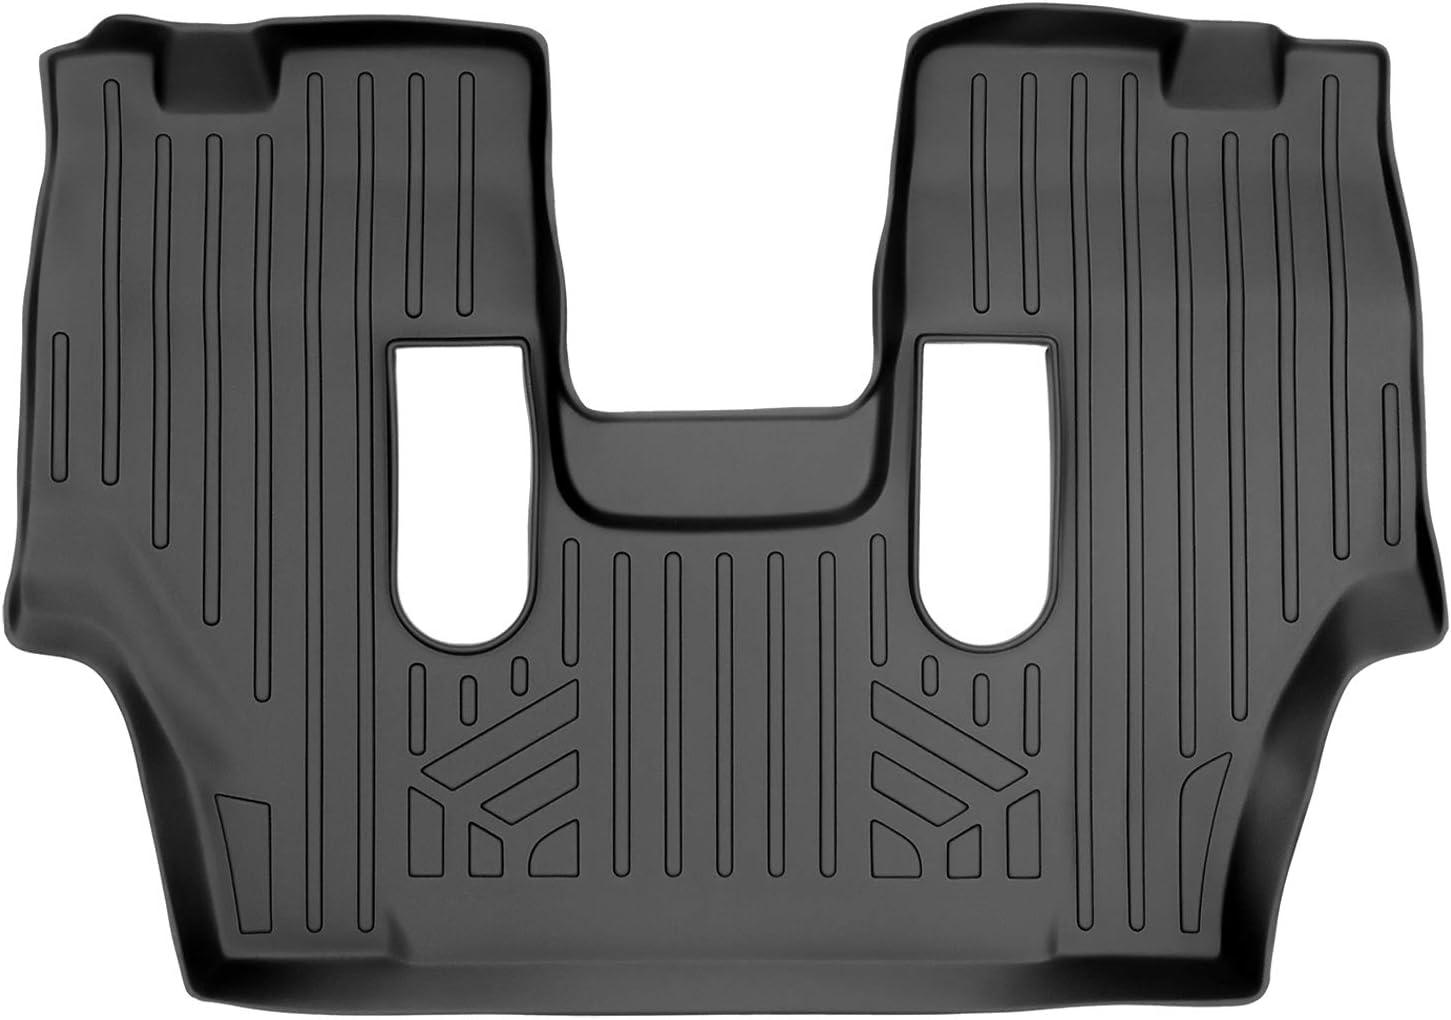 SMARTLINER High order Custom Fit Floor Mats Ranking TOP4 3rd Row Black for 2011-20 Liner